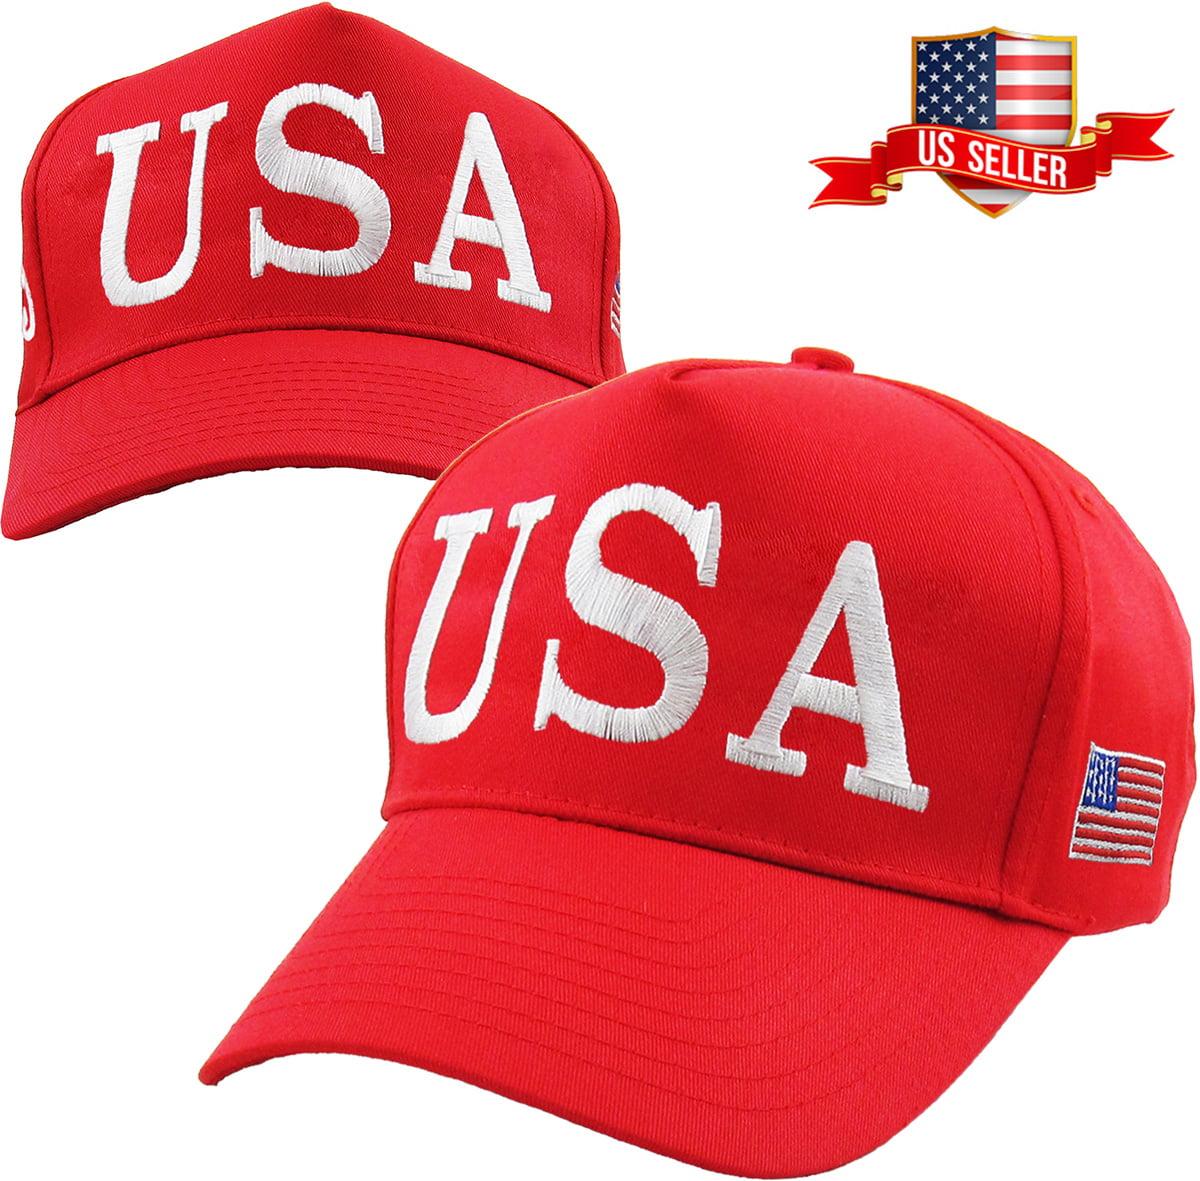 Snapback Cap Blue Embroidery Move America Forward Again